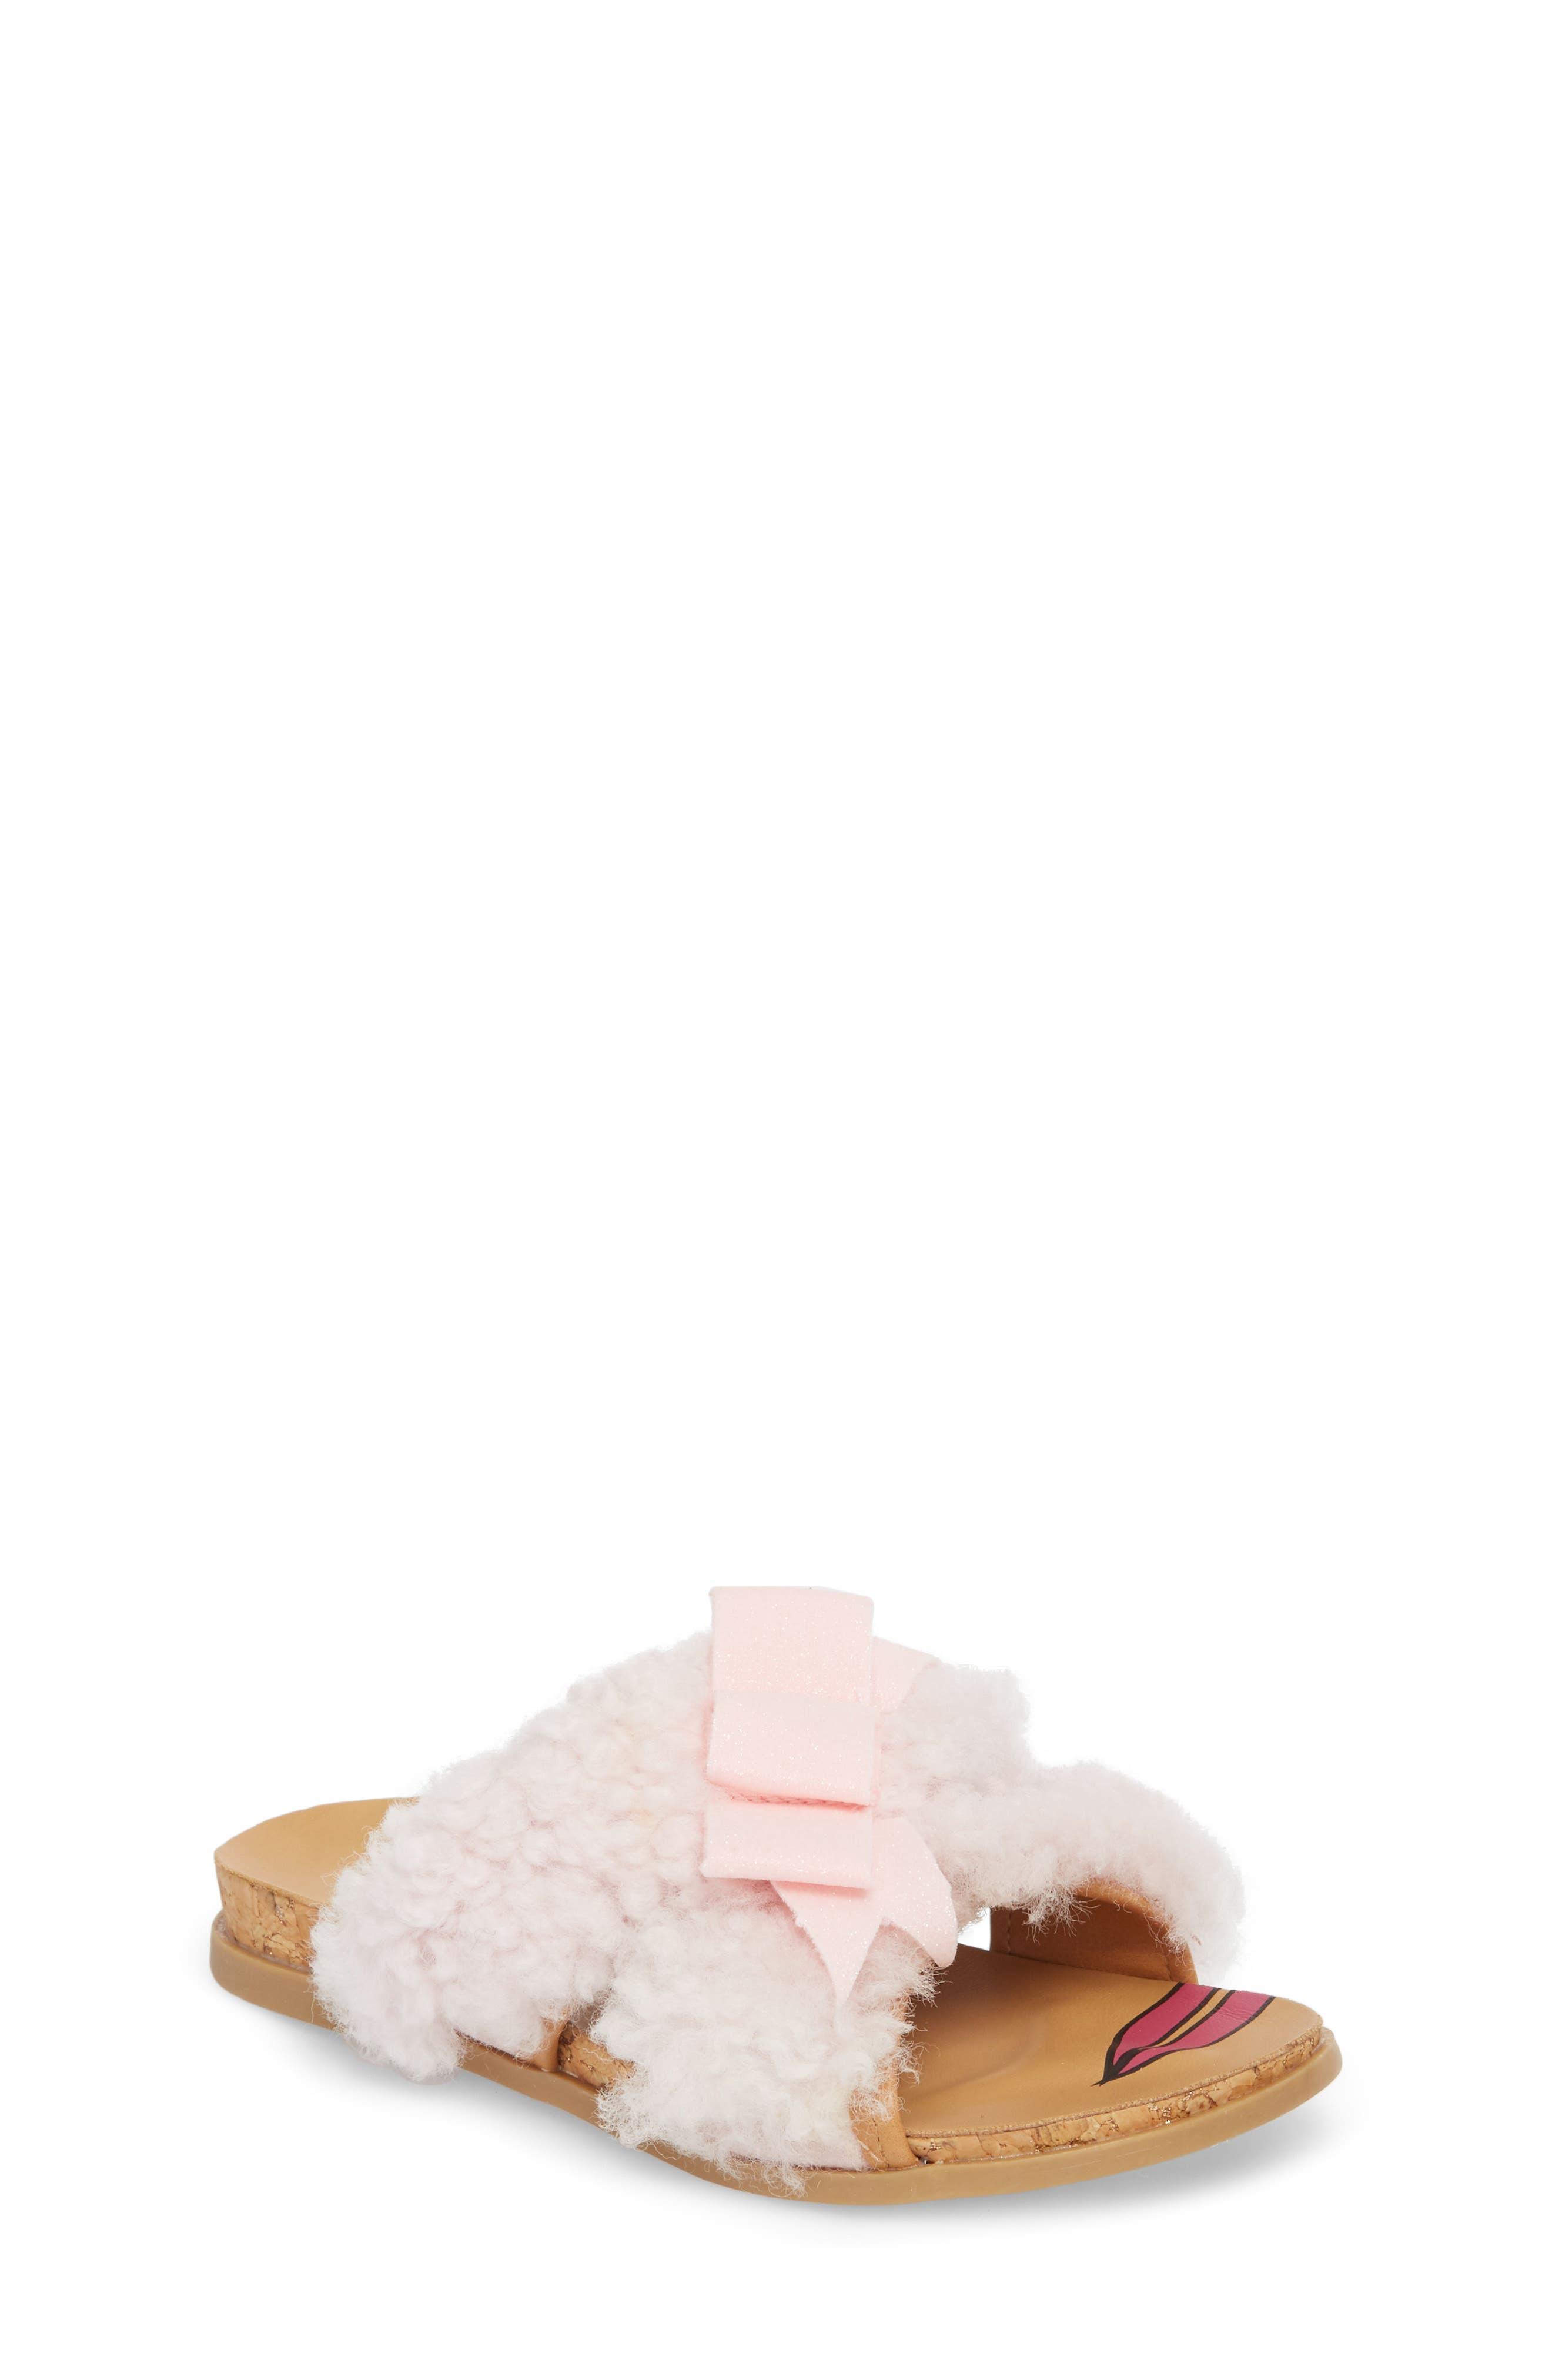 Staceee Genuine Shearling Slide Sandal,                         Main,                         color, Seashell Pink